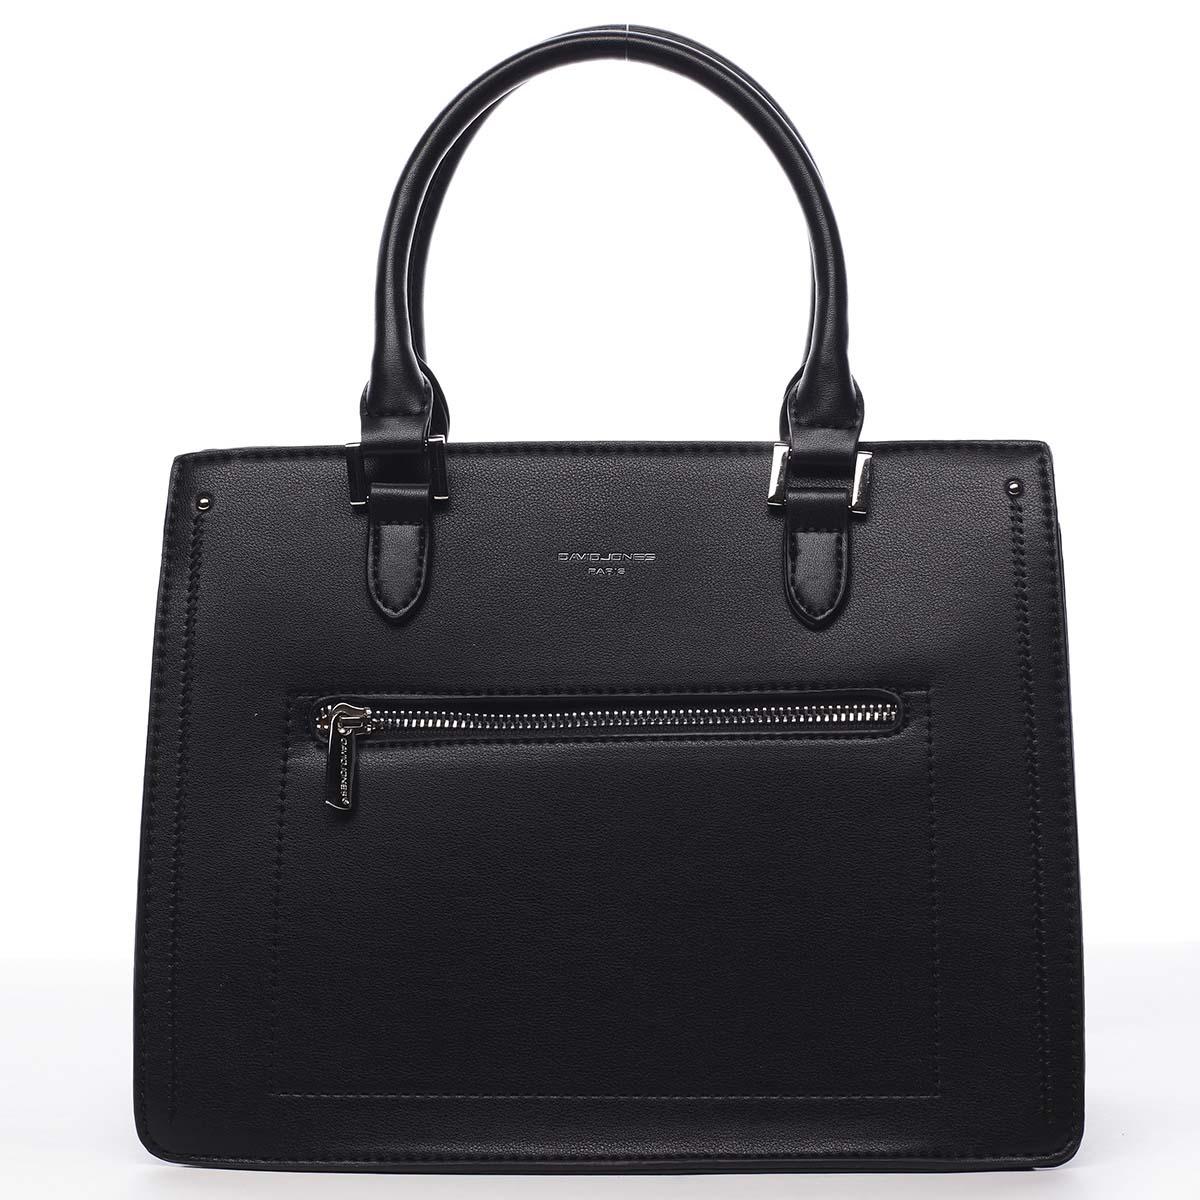 Dámska kabelka do ruky čierna - David Jones Samentha čierna